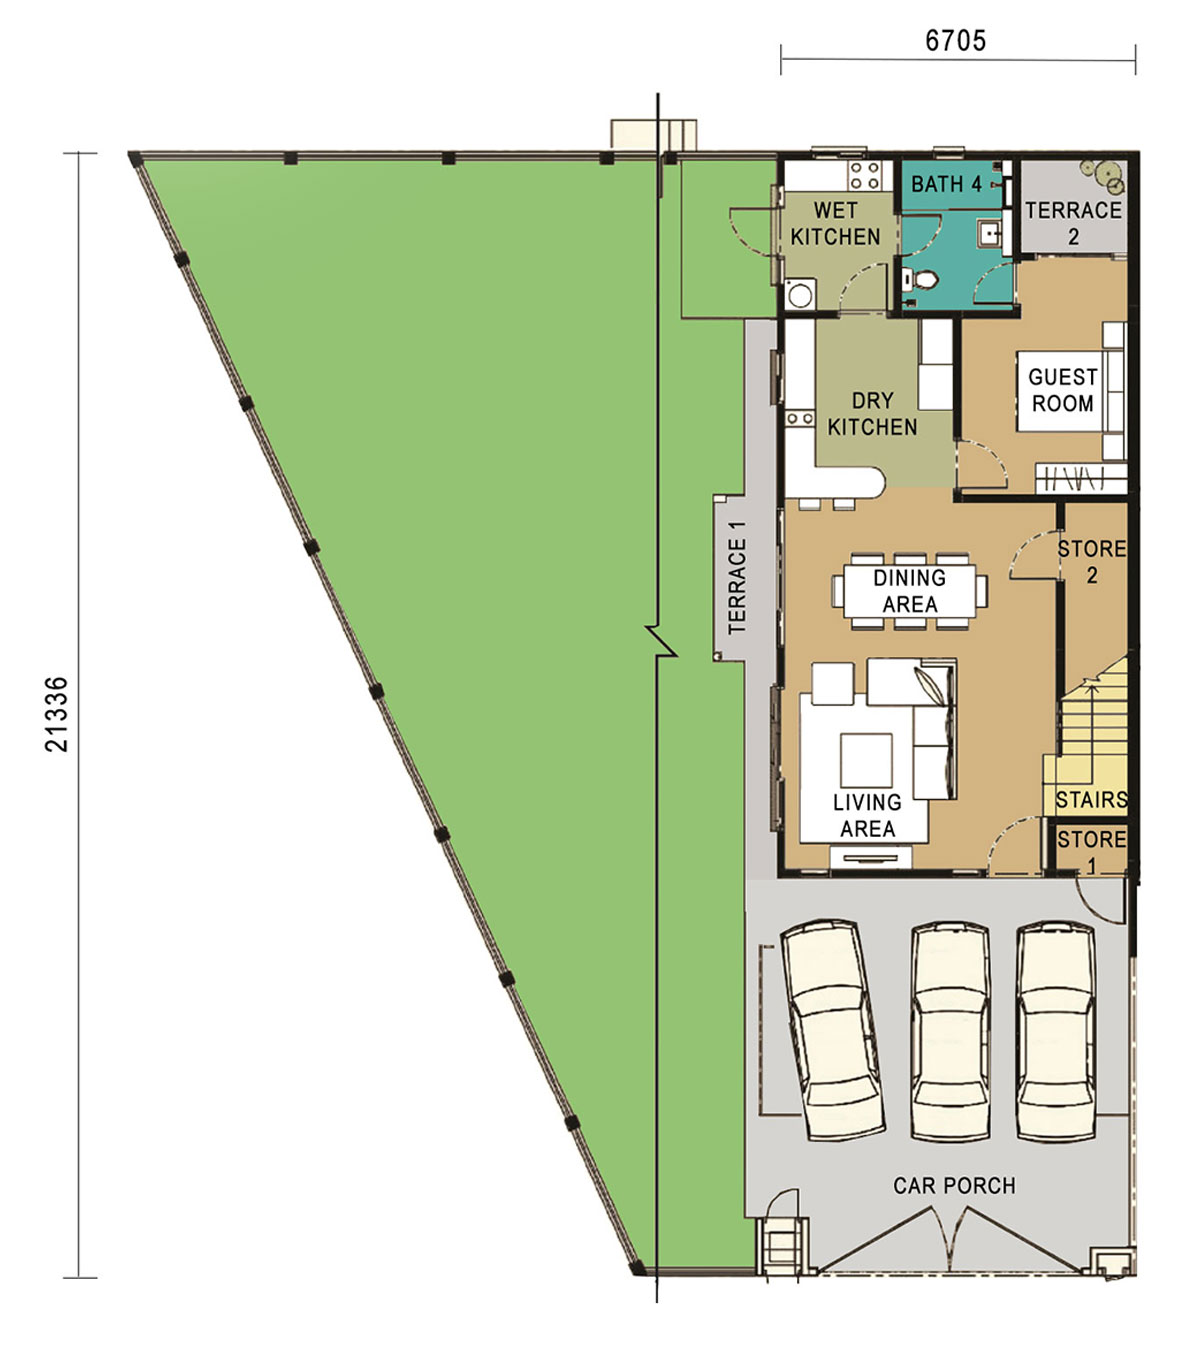 2-Storey Link Home - Corner Unit - Ground Floor